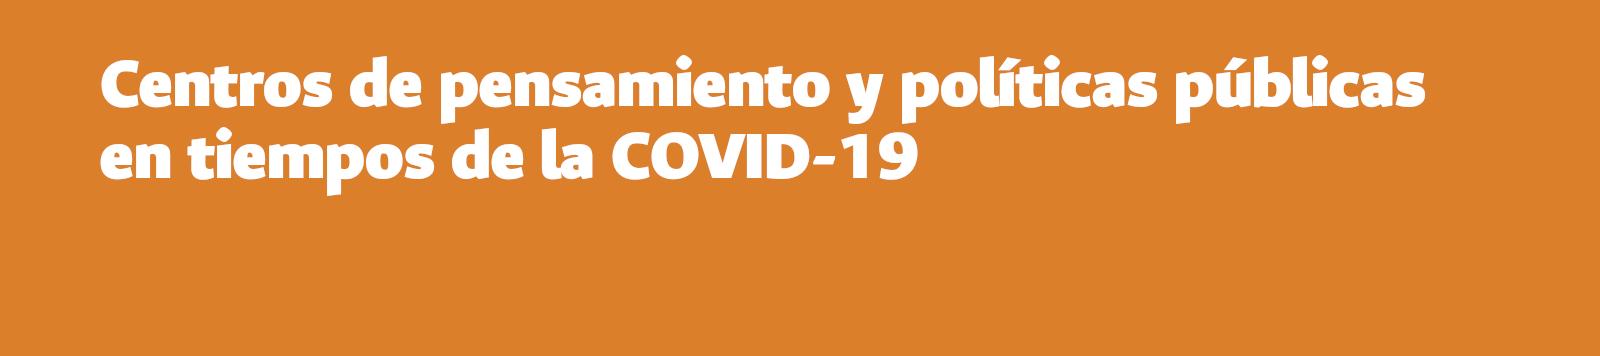 EPPU COVID-19